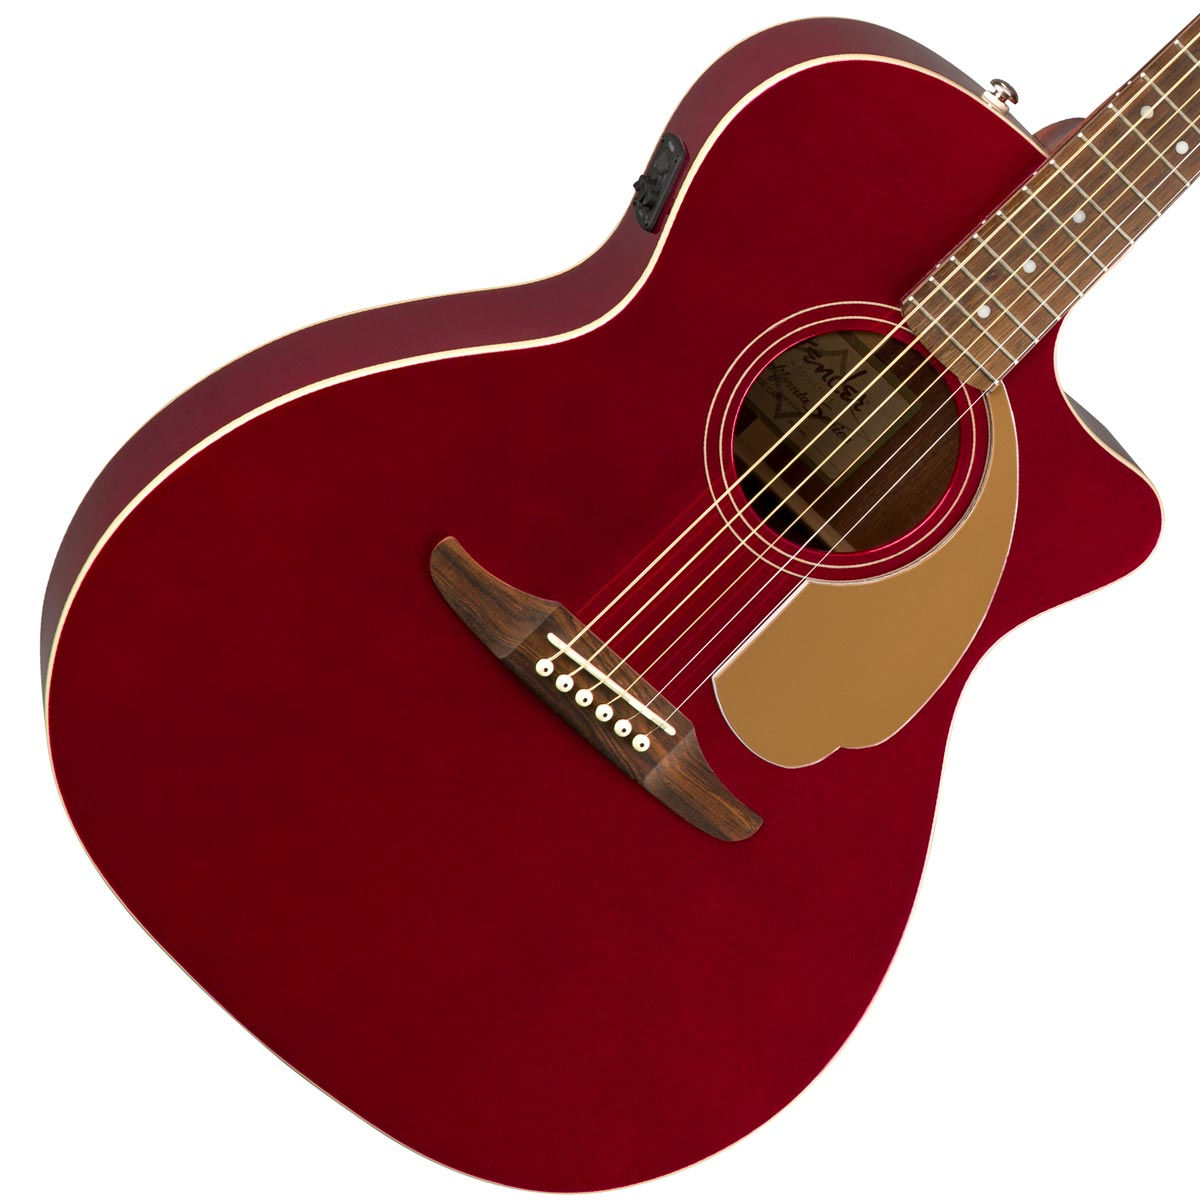 FENDER / NEWPORTER PLAYER CANDY APPLE RED (CAR)【CALIFORNIA SERIES】フェンダー アコースティックギター【YRK】